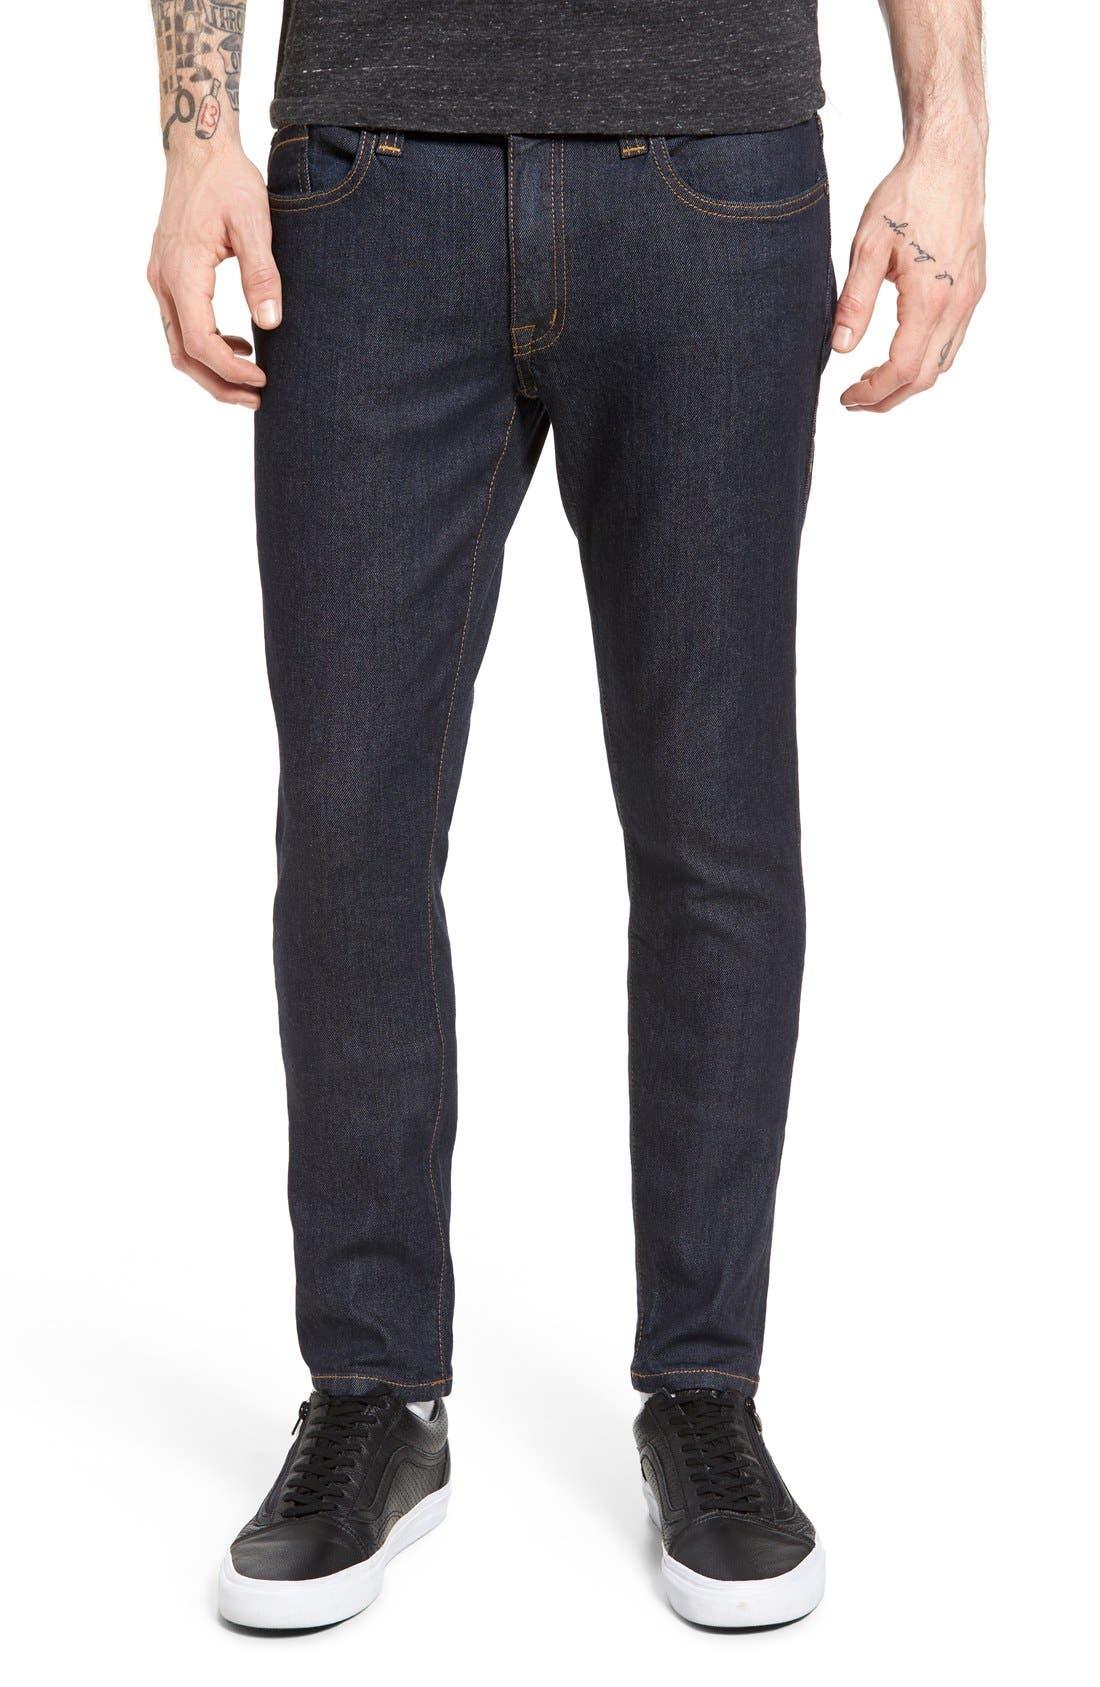 Vantage Skinny Fit Jeans,                             Main thumbnail 1, color,